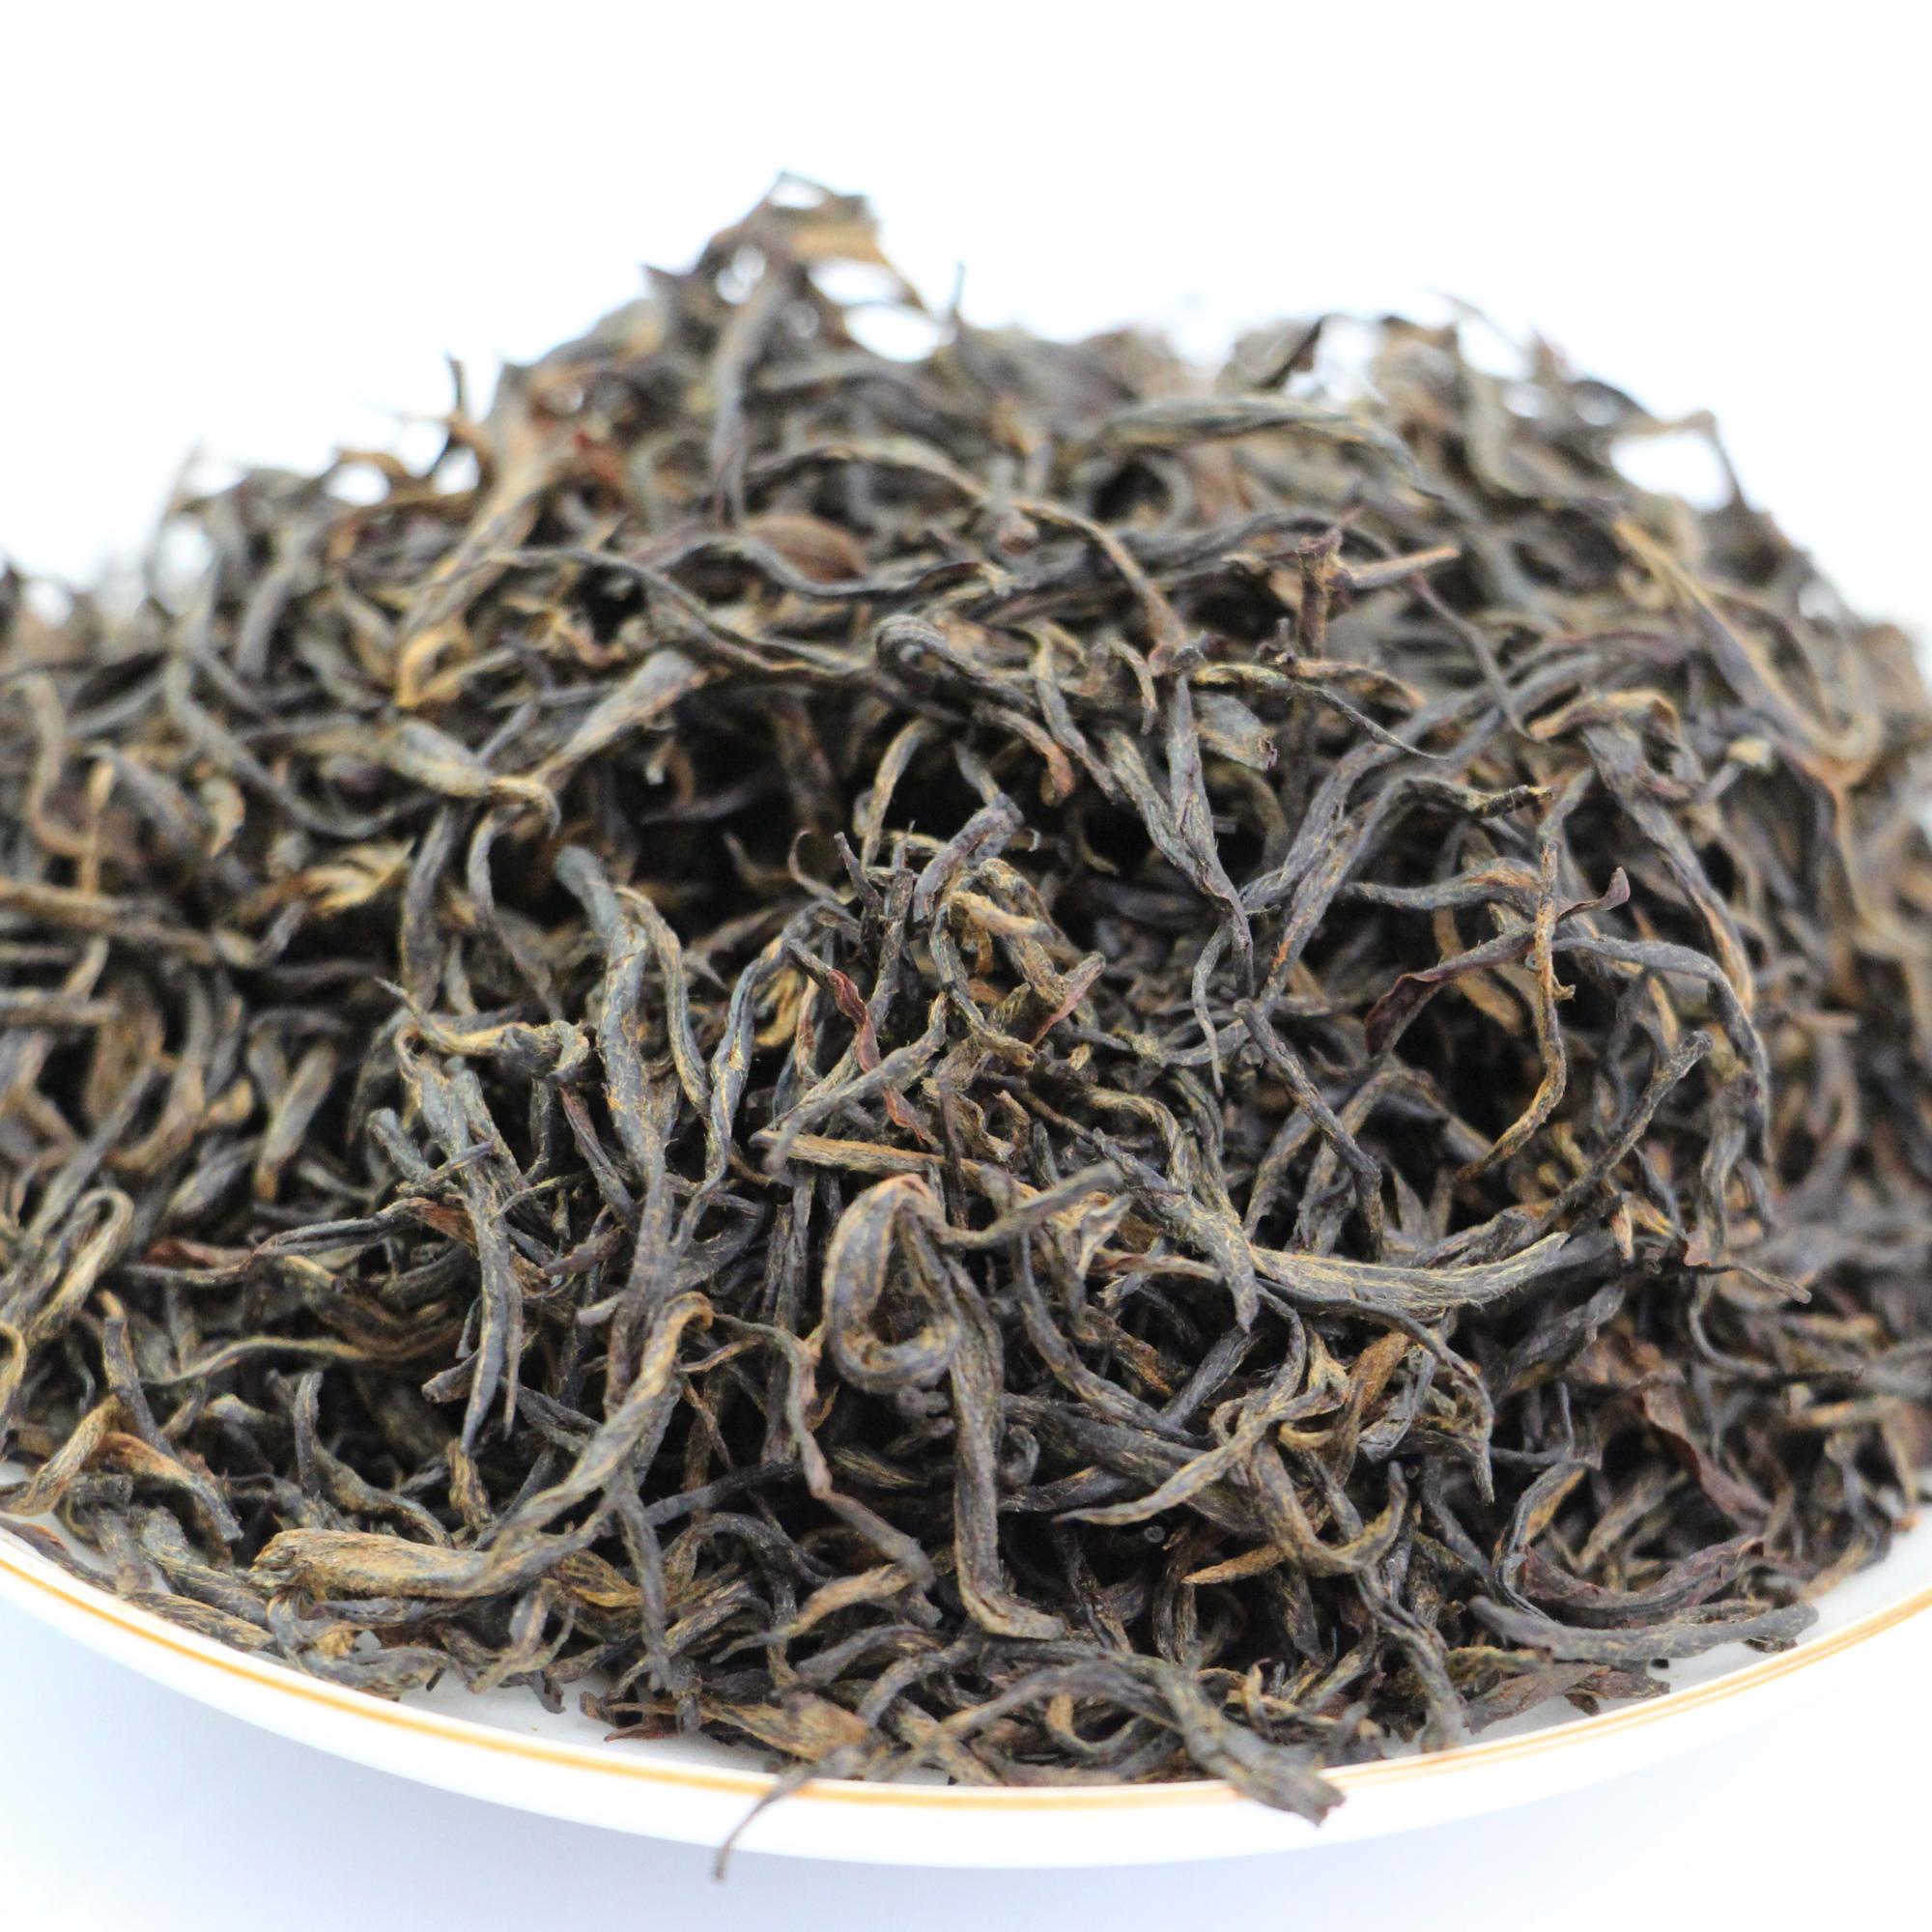 5A-Chinese organic black tea Selected pre Ming sprout tea - 4uTea   4uTea.com